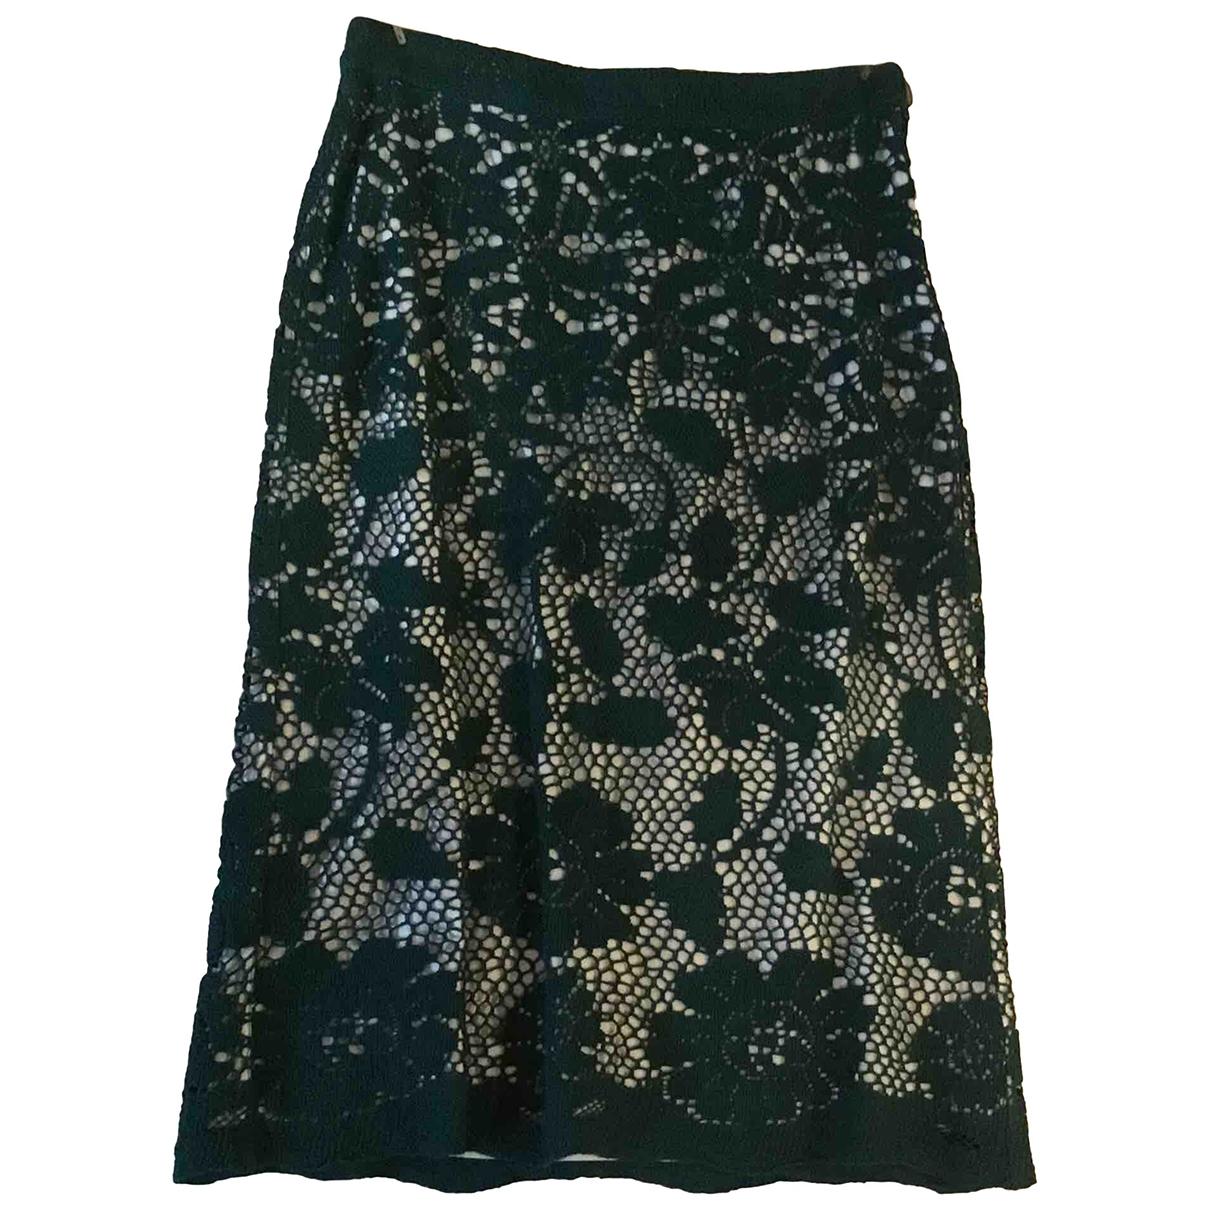 Clements Ribeiro \N Green Cotton skirt for Women 42 IT